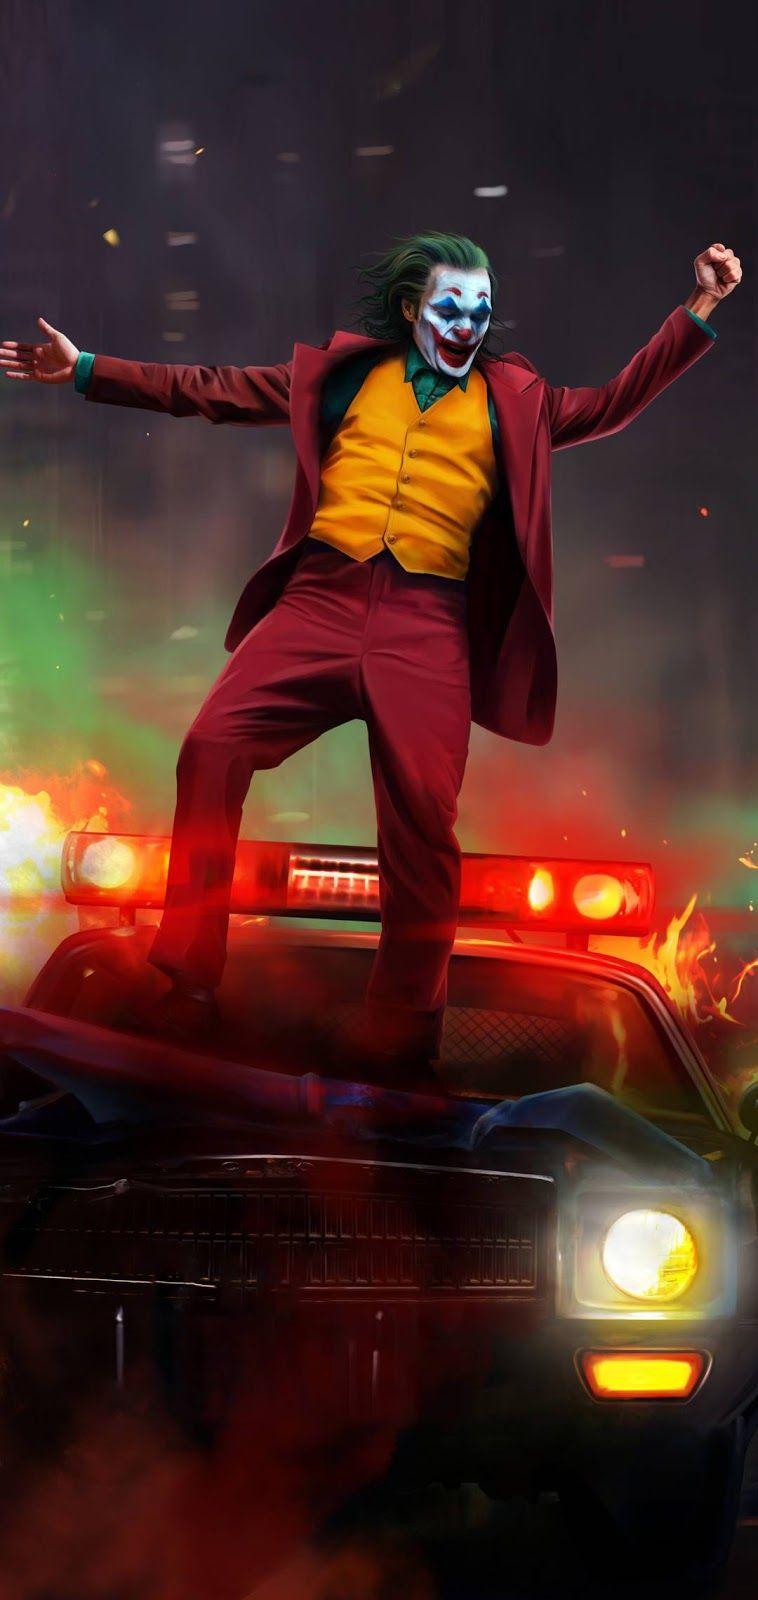 Los mejores fondos de pantallas de The Joker para tu celular   Guason